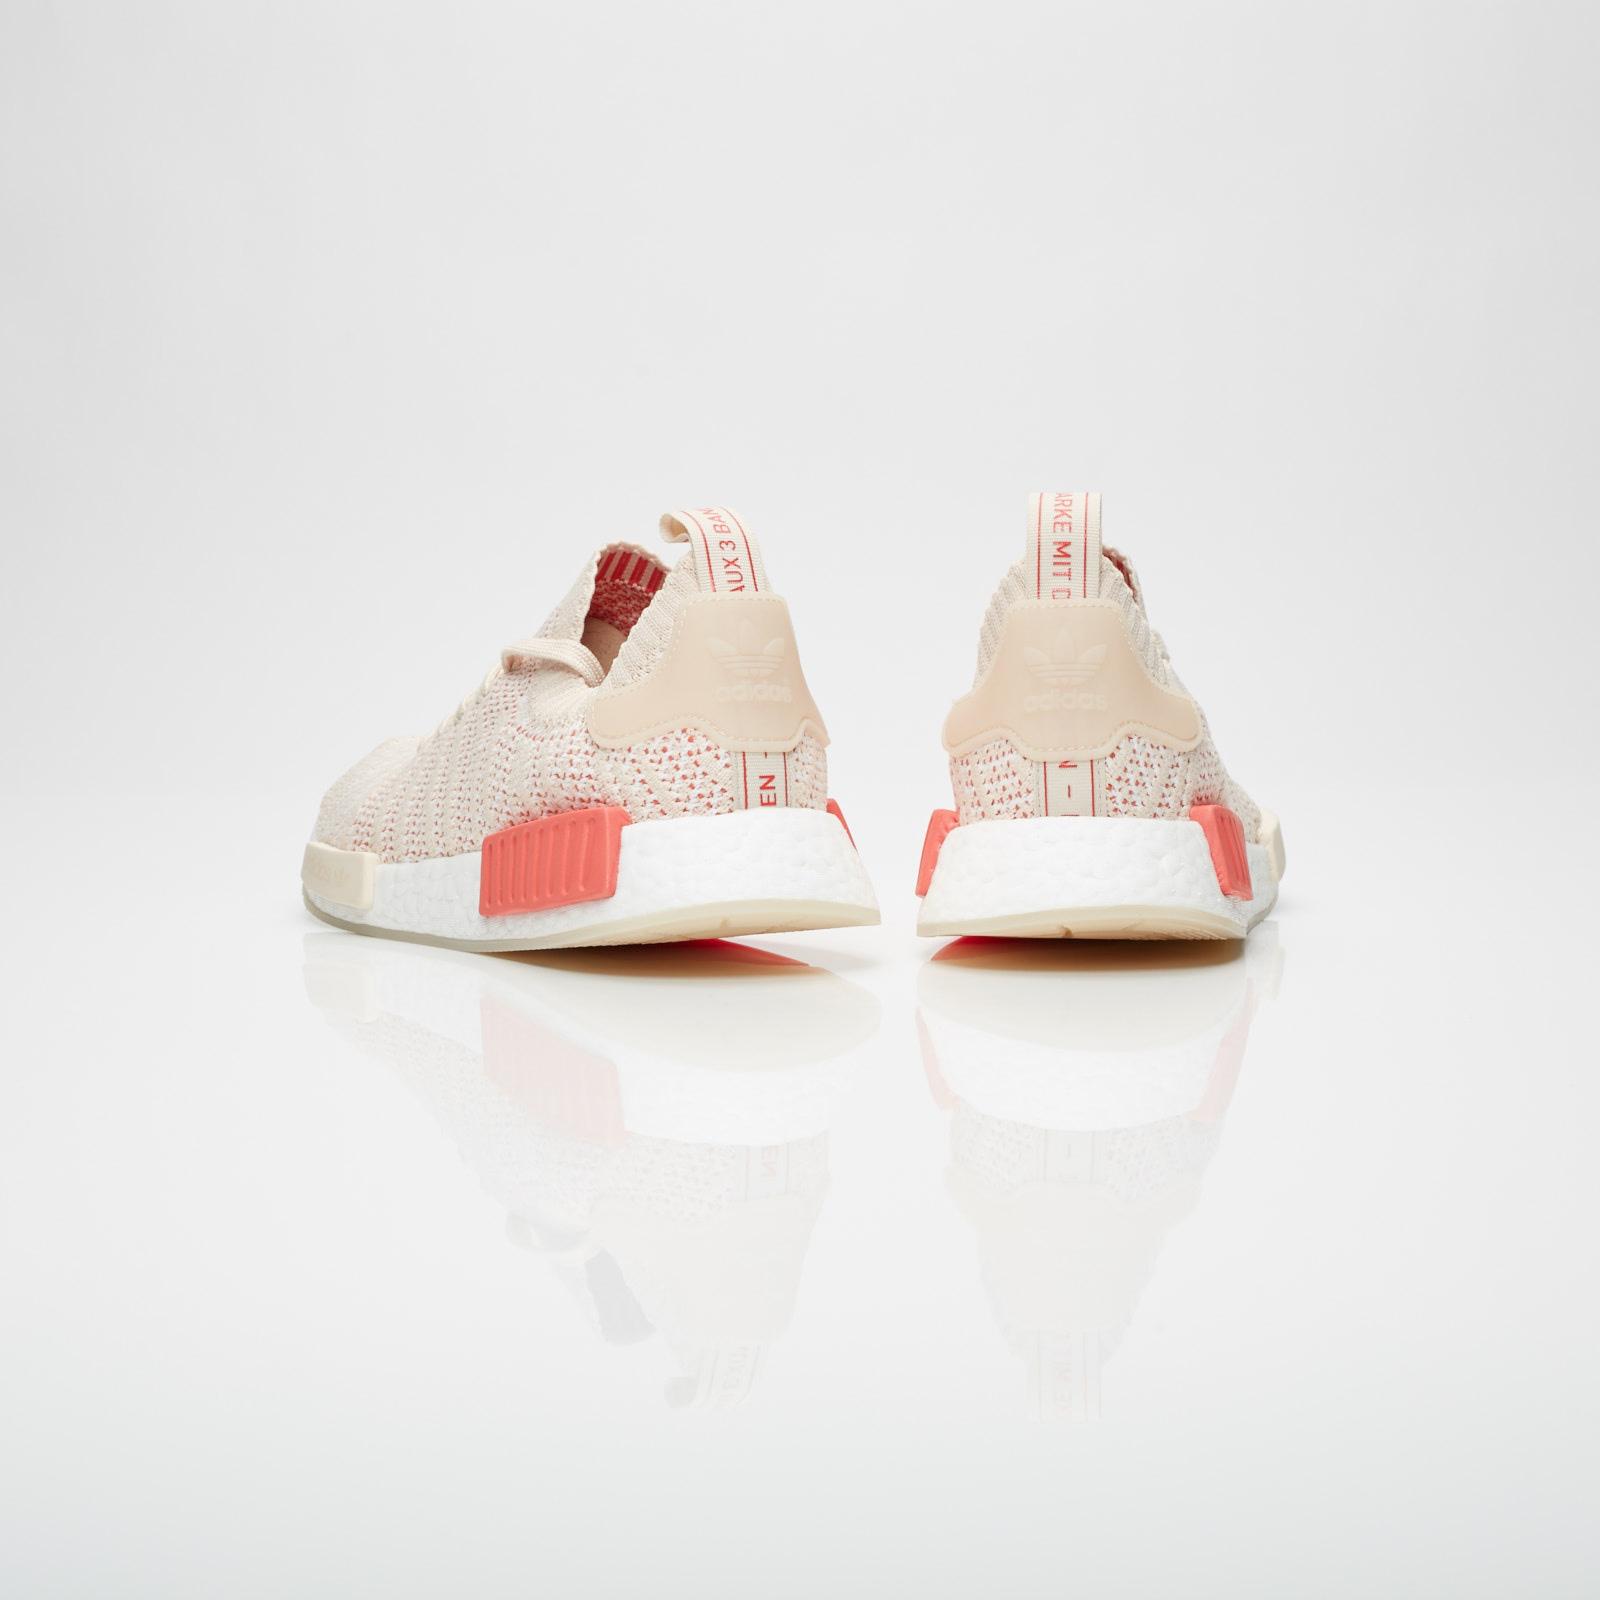 Adidas Nmd R1 Stlt Pk W Cq2030 Sneakersnstuff Sneaker